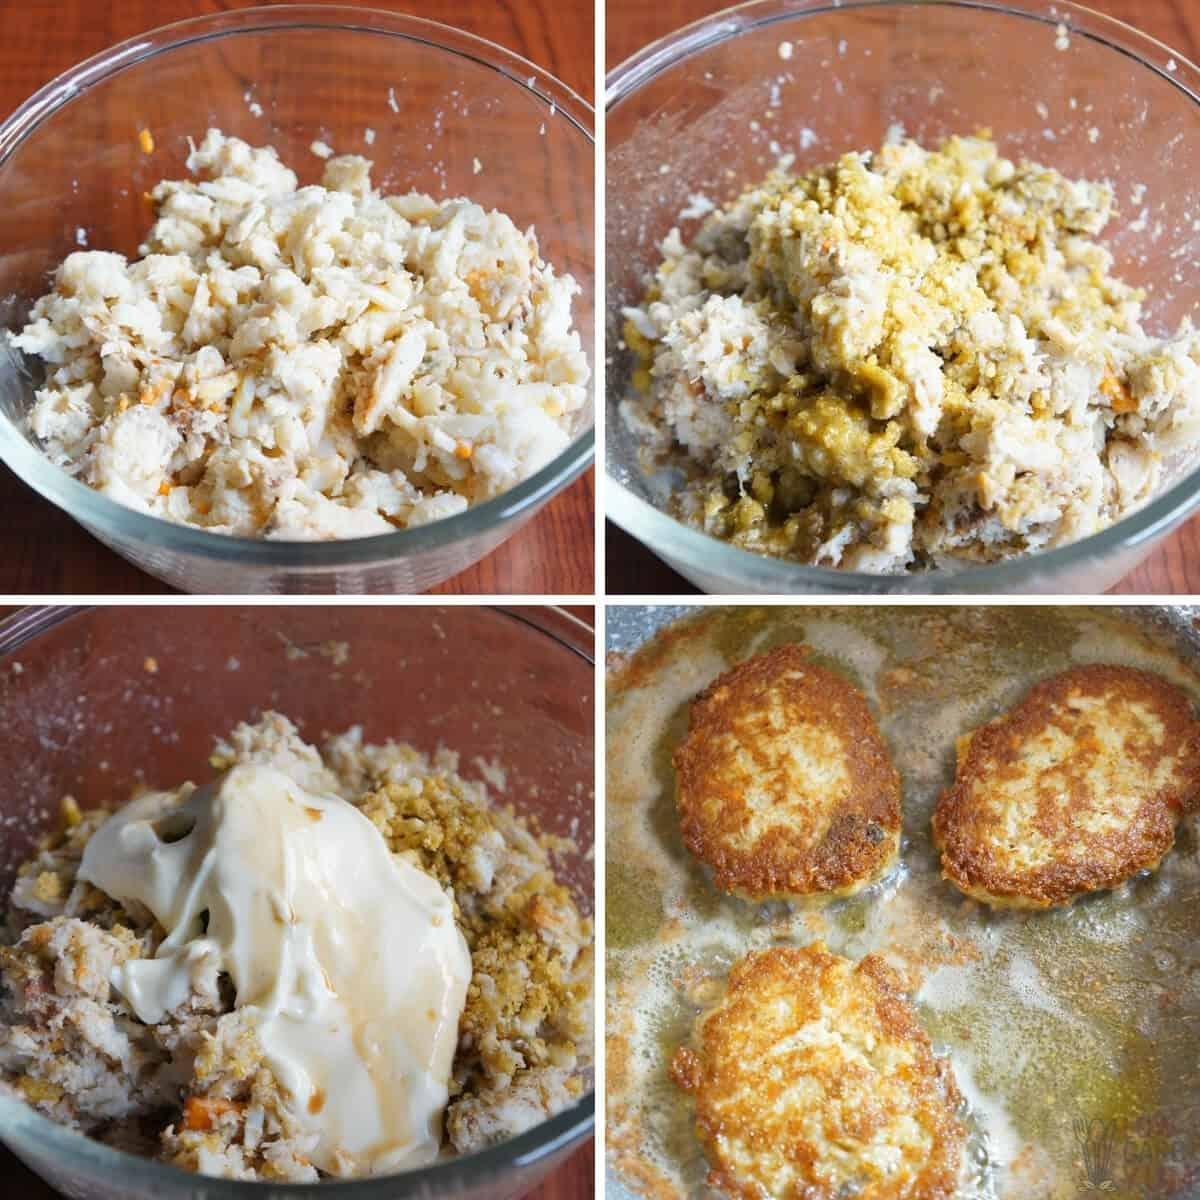 keto crab cakes recipe final preparation